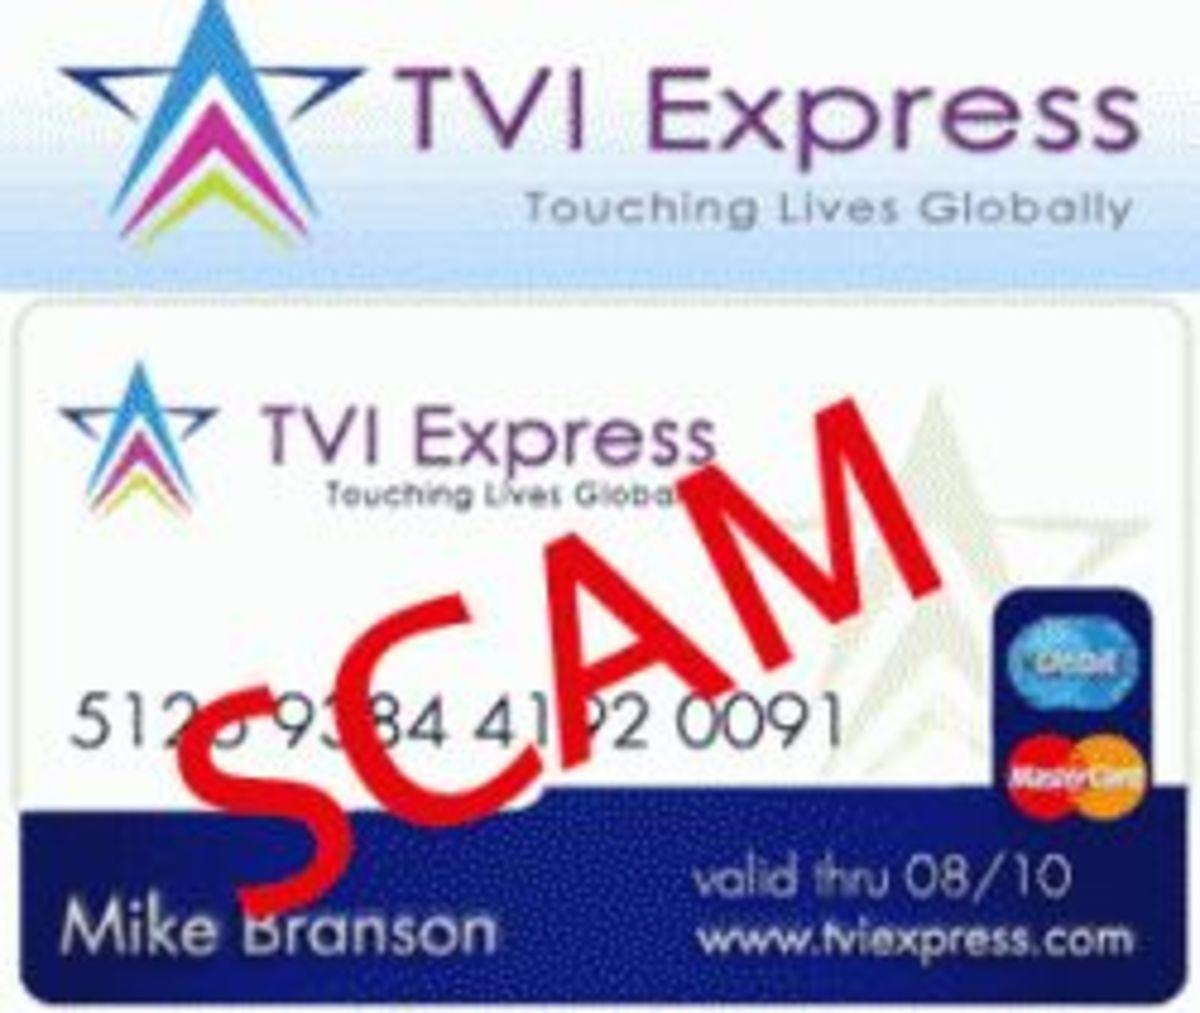 Tviexpress scam warren buffett owns tvi express and 6 other tviexpress scam warren buffett owns tvi express and 6 other lies it and its members are telling reheart Image collections